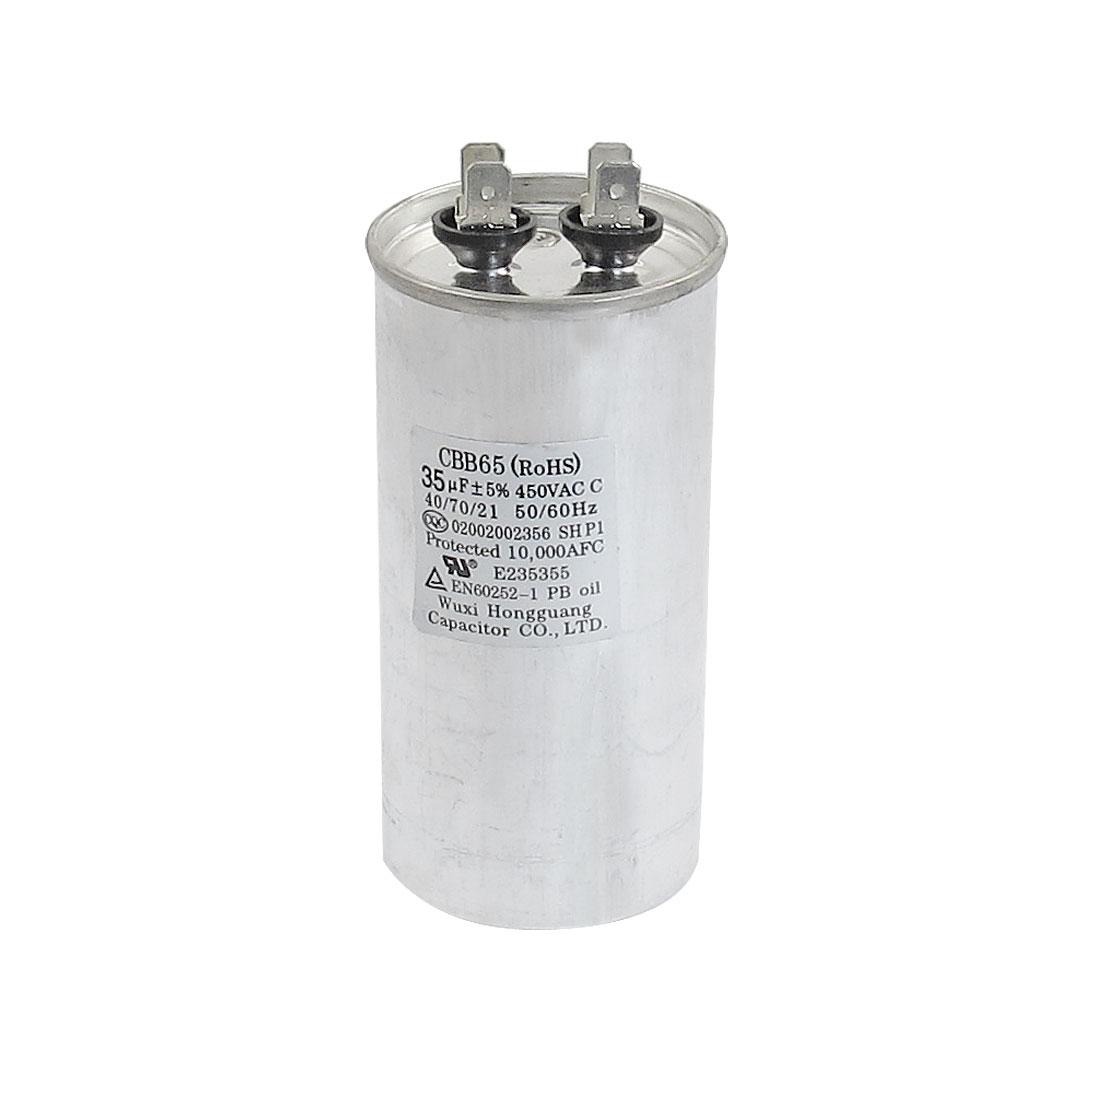 450VAC 35uF Cylindrical Refrigerator Motor Running Capacitor CBB65